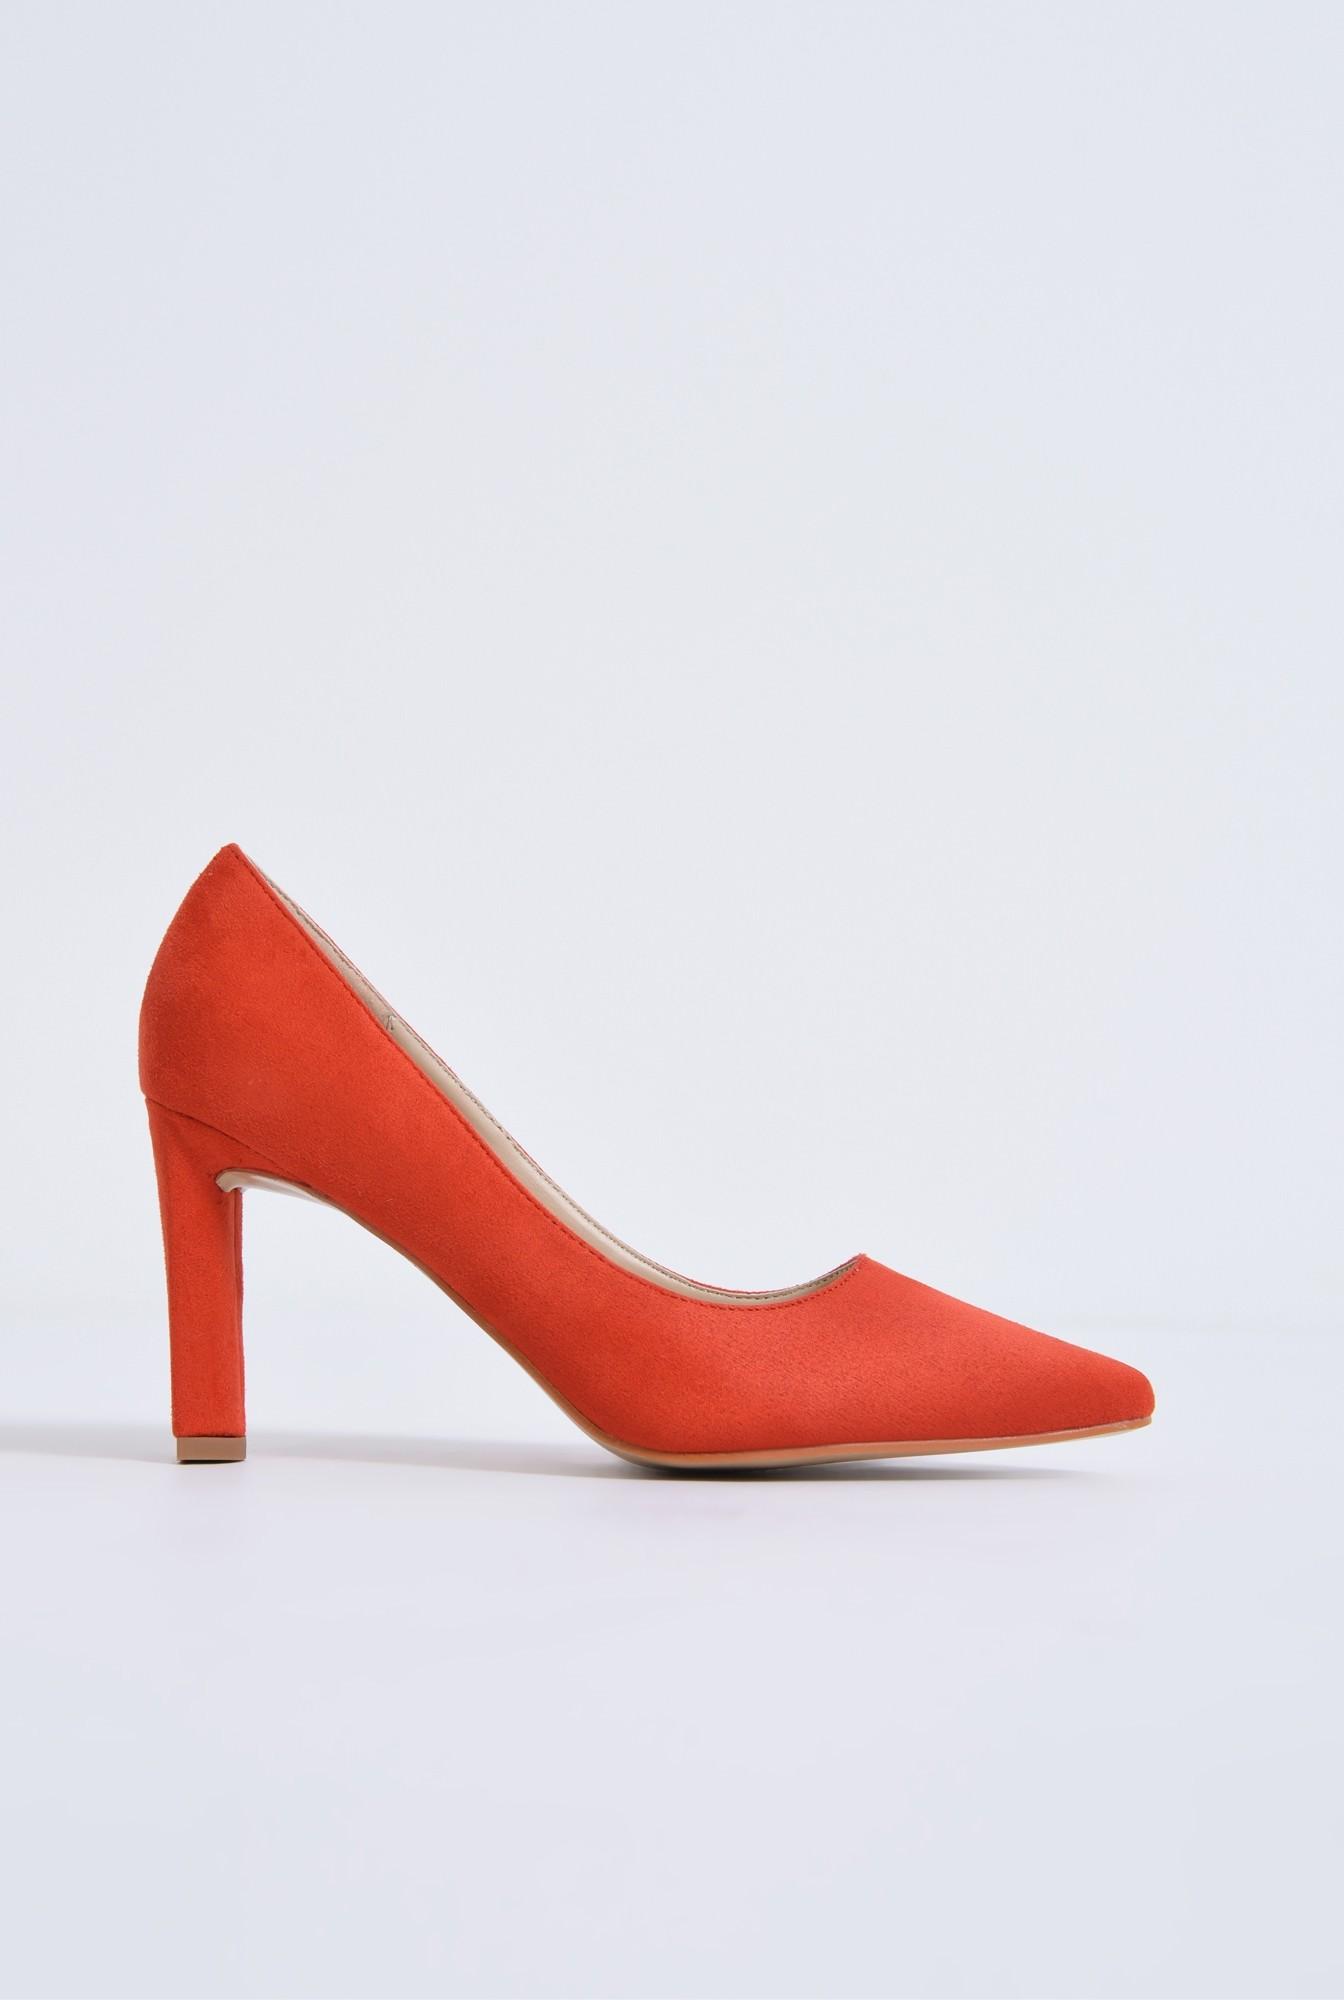 0 - pantofi casual, rosu, toc inalt